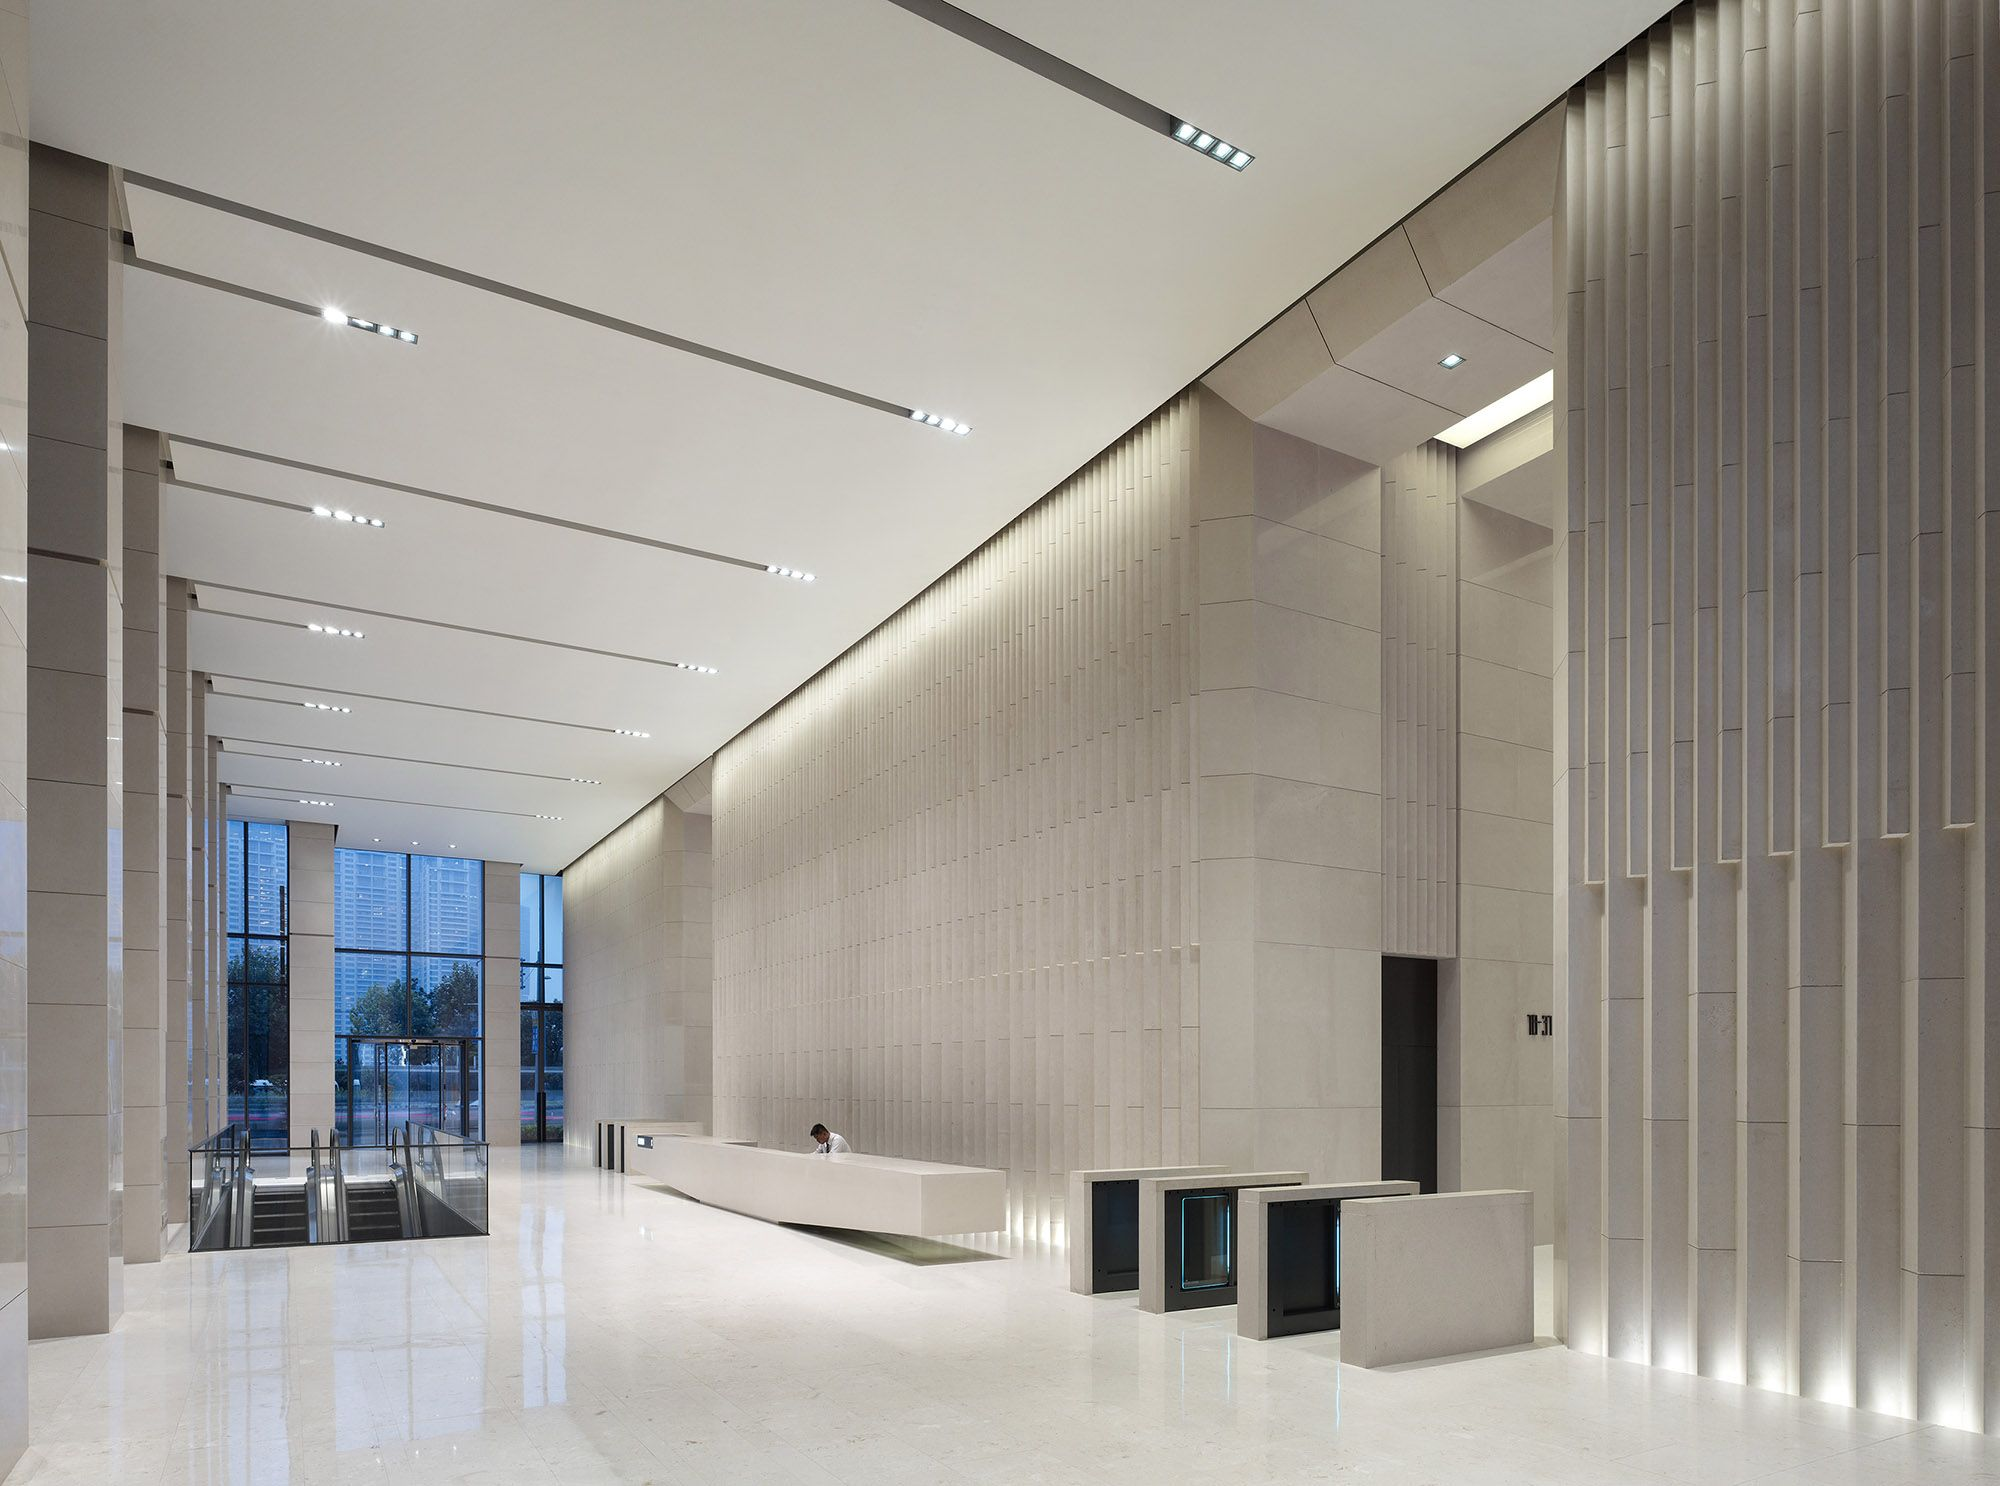 Pin by edwin arokiyam on interior lobby design office - Office building interior design ideas ...